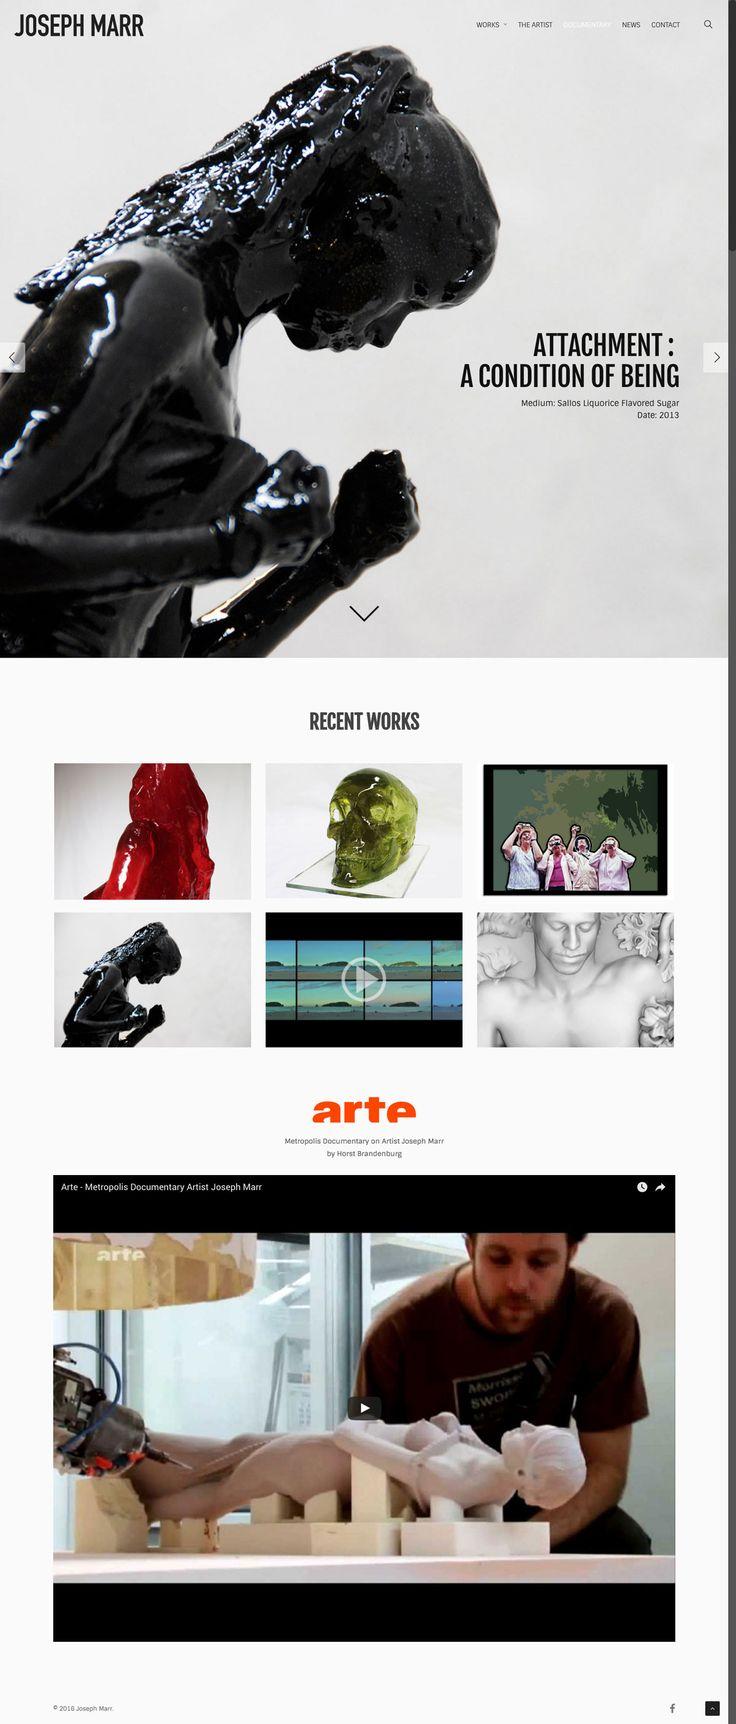 New responsive website design by KORE (http://kore.digital/) for Joseph Marr fine artist, Berlin. Home page. #responsivedesign #webdesign #wordpress